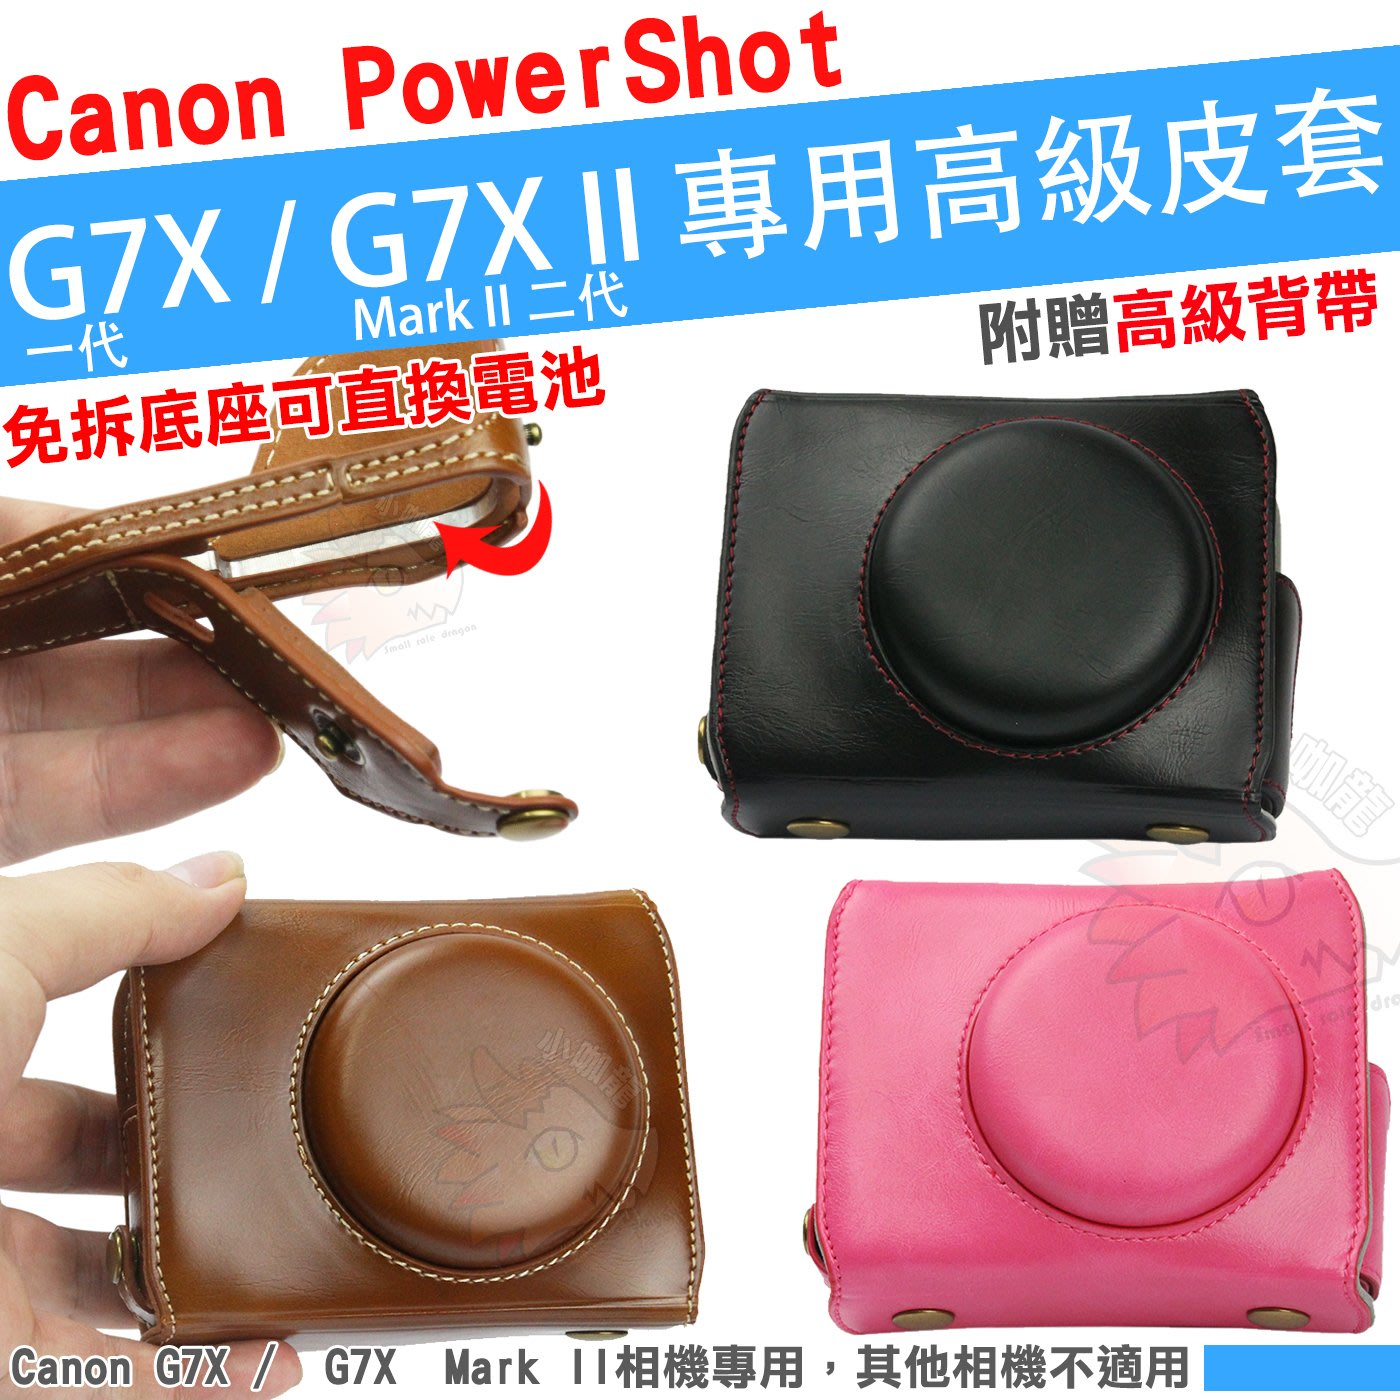 Canon PowerShot G7X / G7X Mark II 兩件式皮套 免拆底座換電池 相機包 保護套 棕色 黑